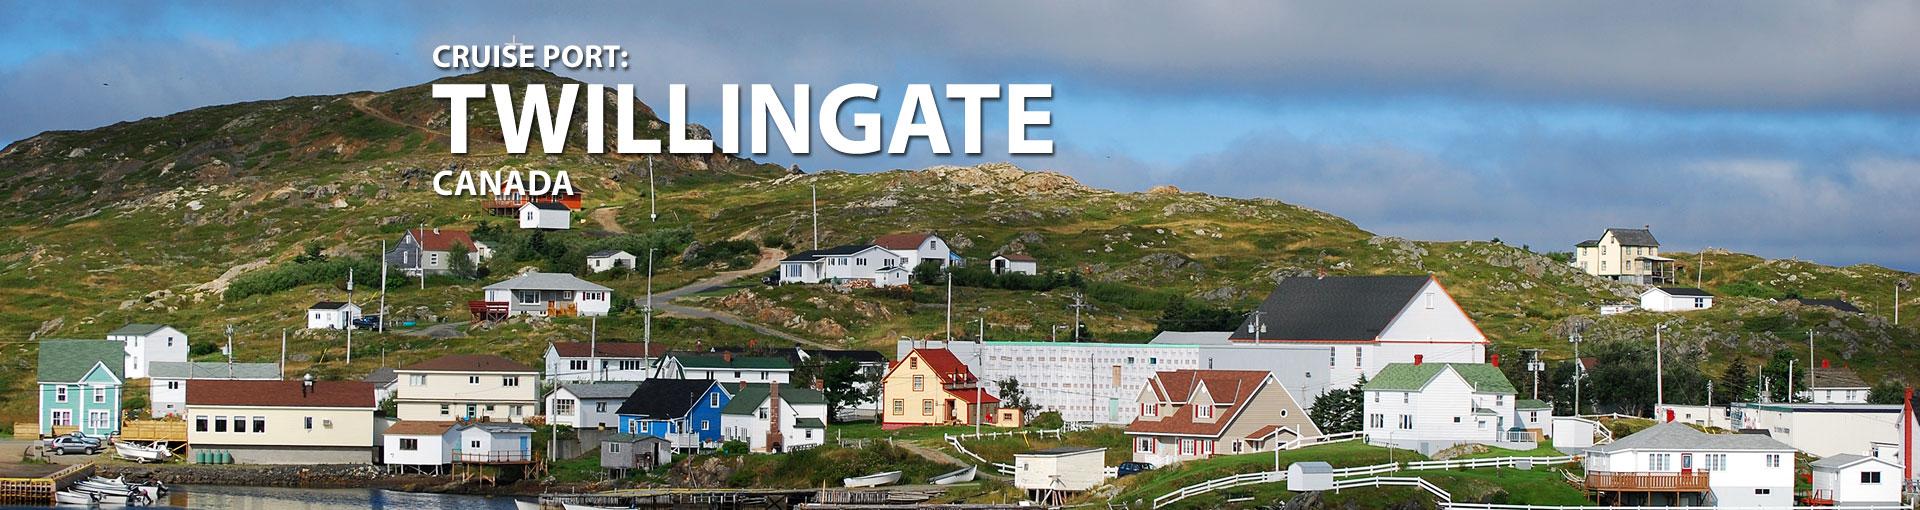 Cruises to Twillingate, Canada